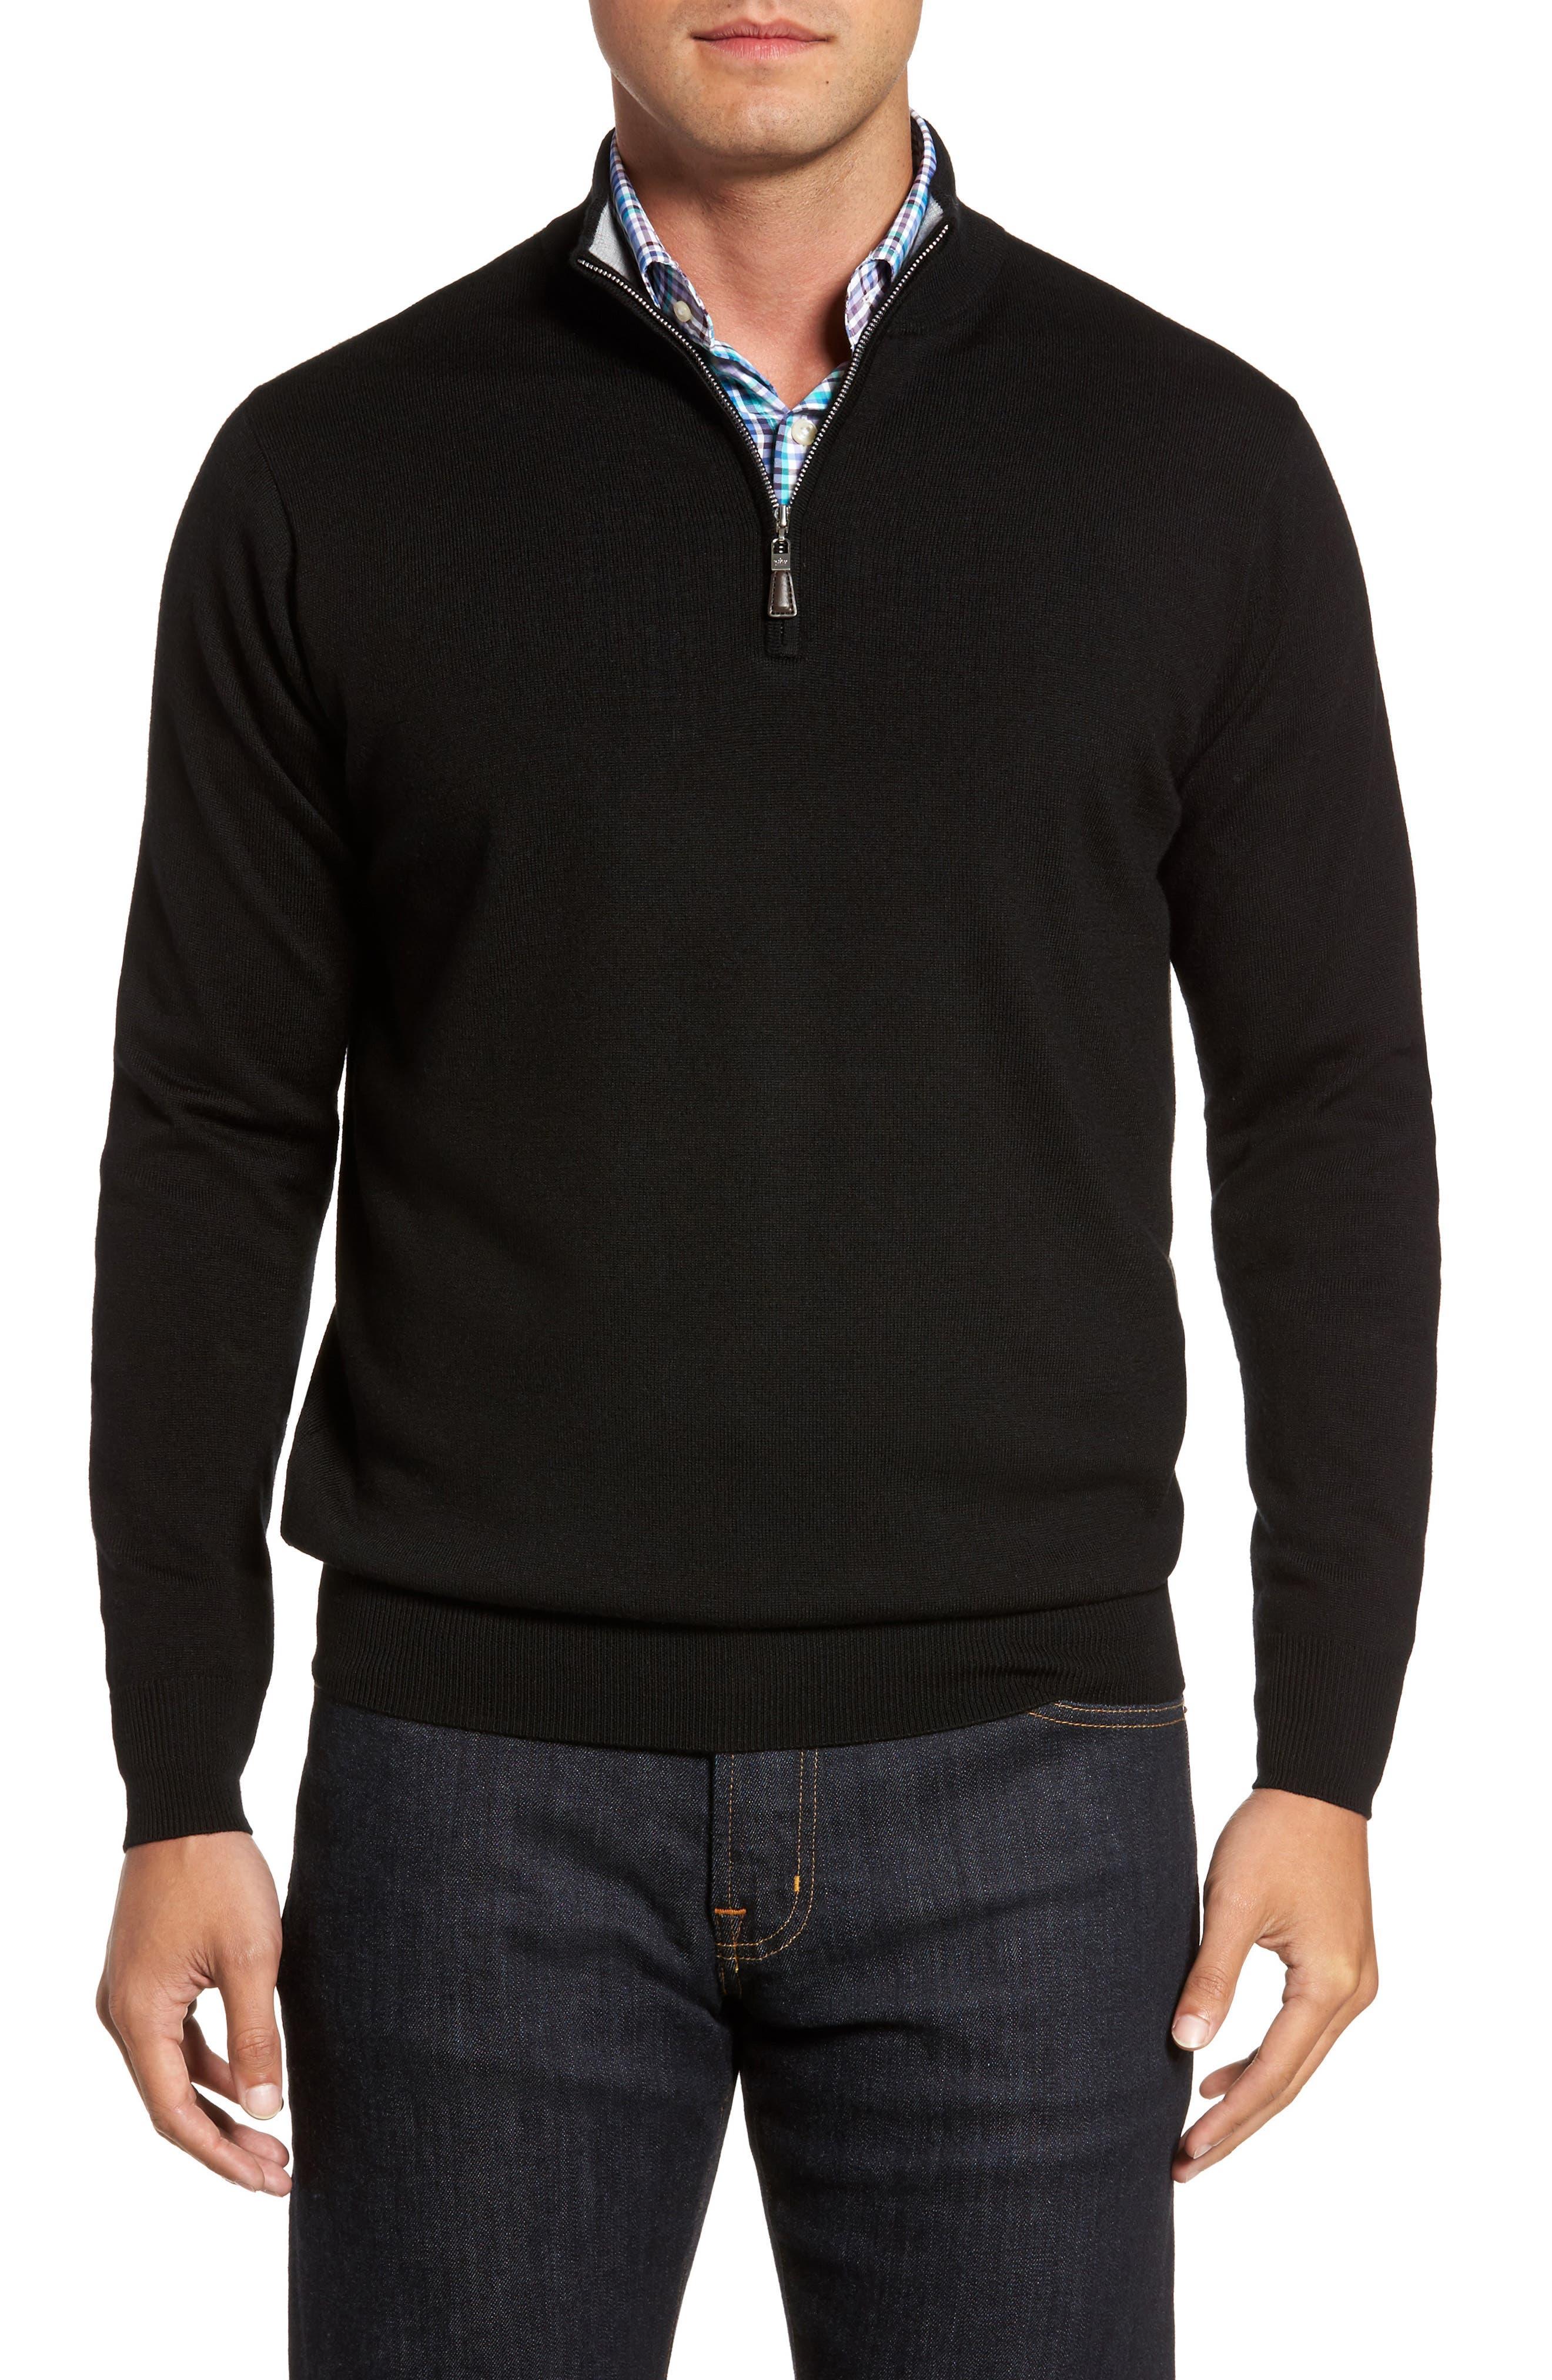 Crown Soft Merino Blend Quarter Zip Sweater,                             Main thumbnail 1, color,                             001